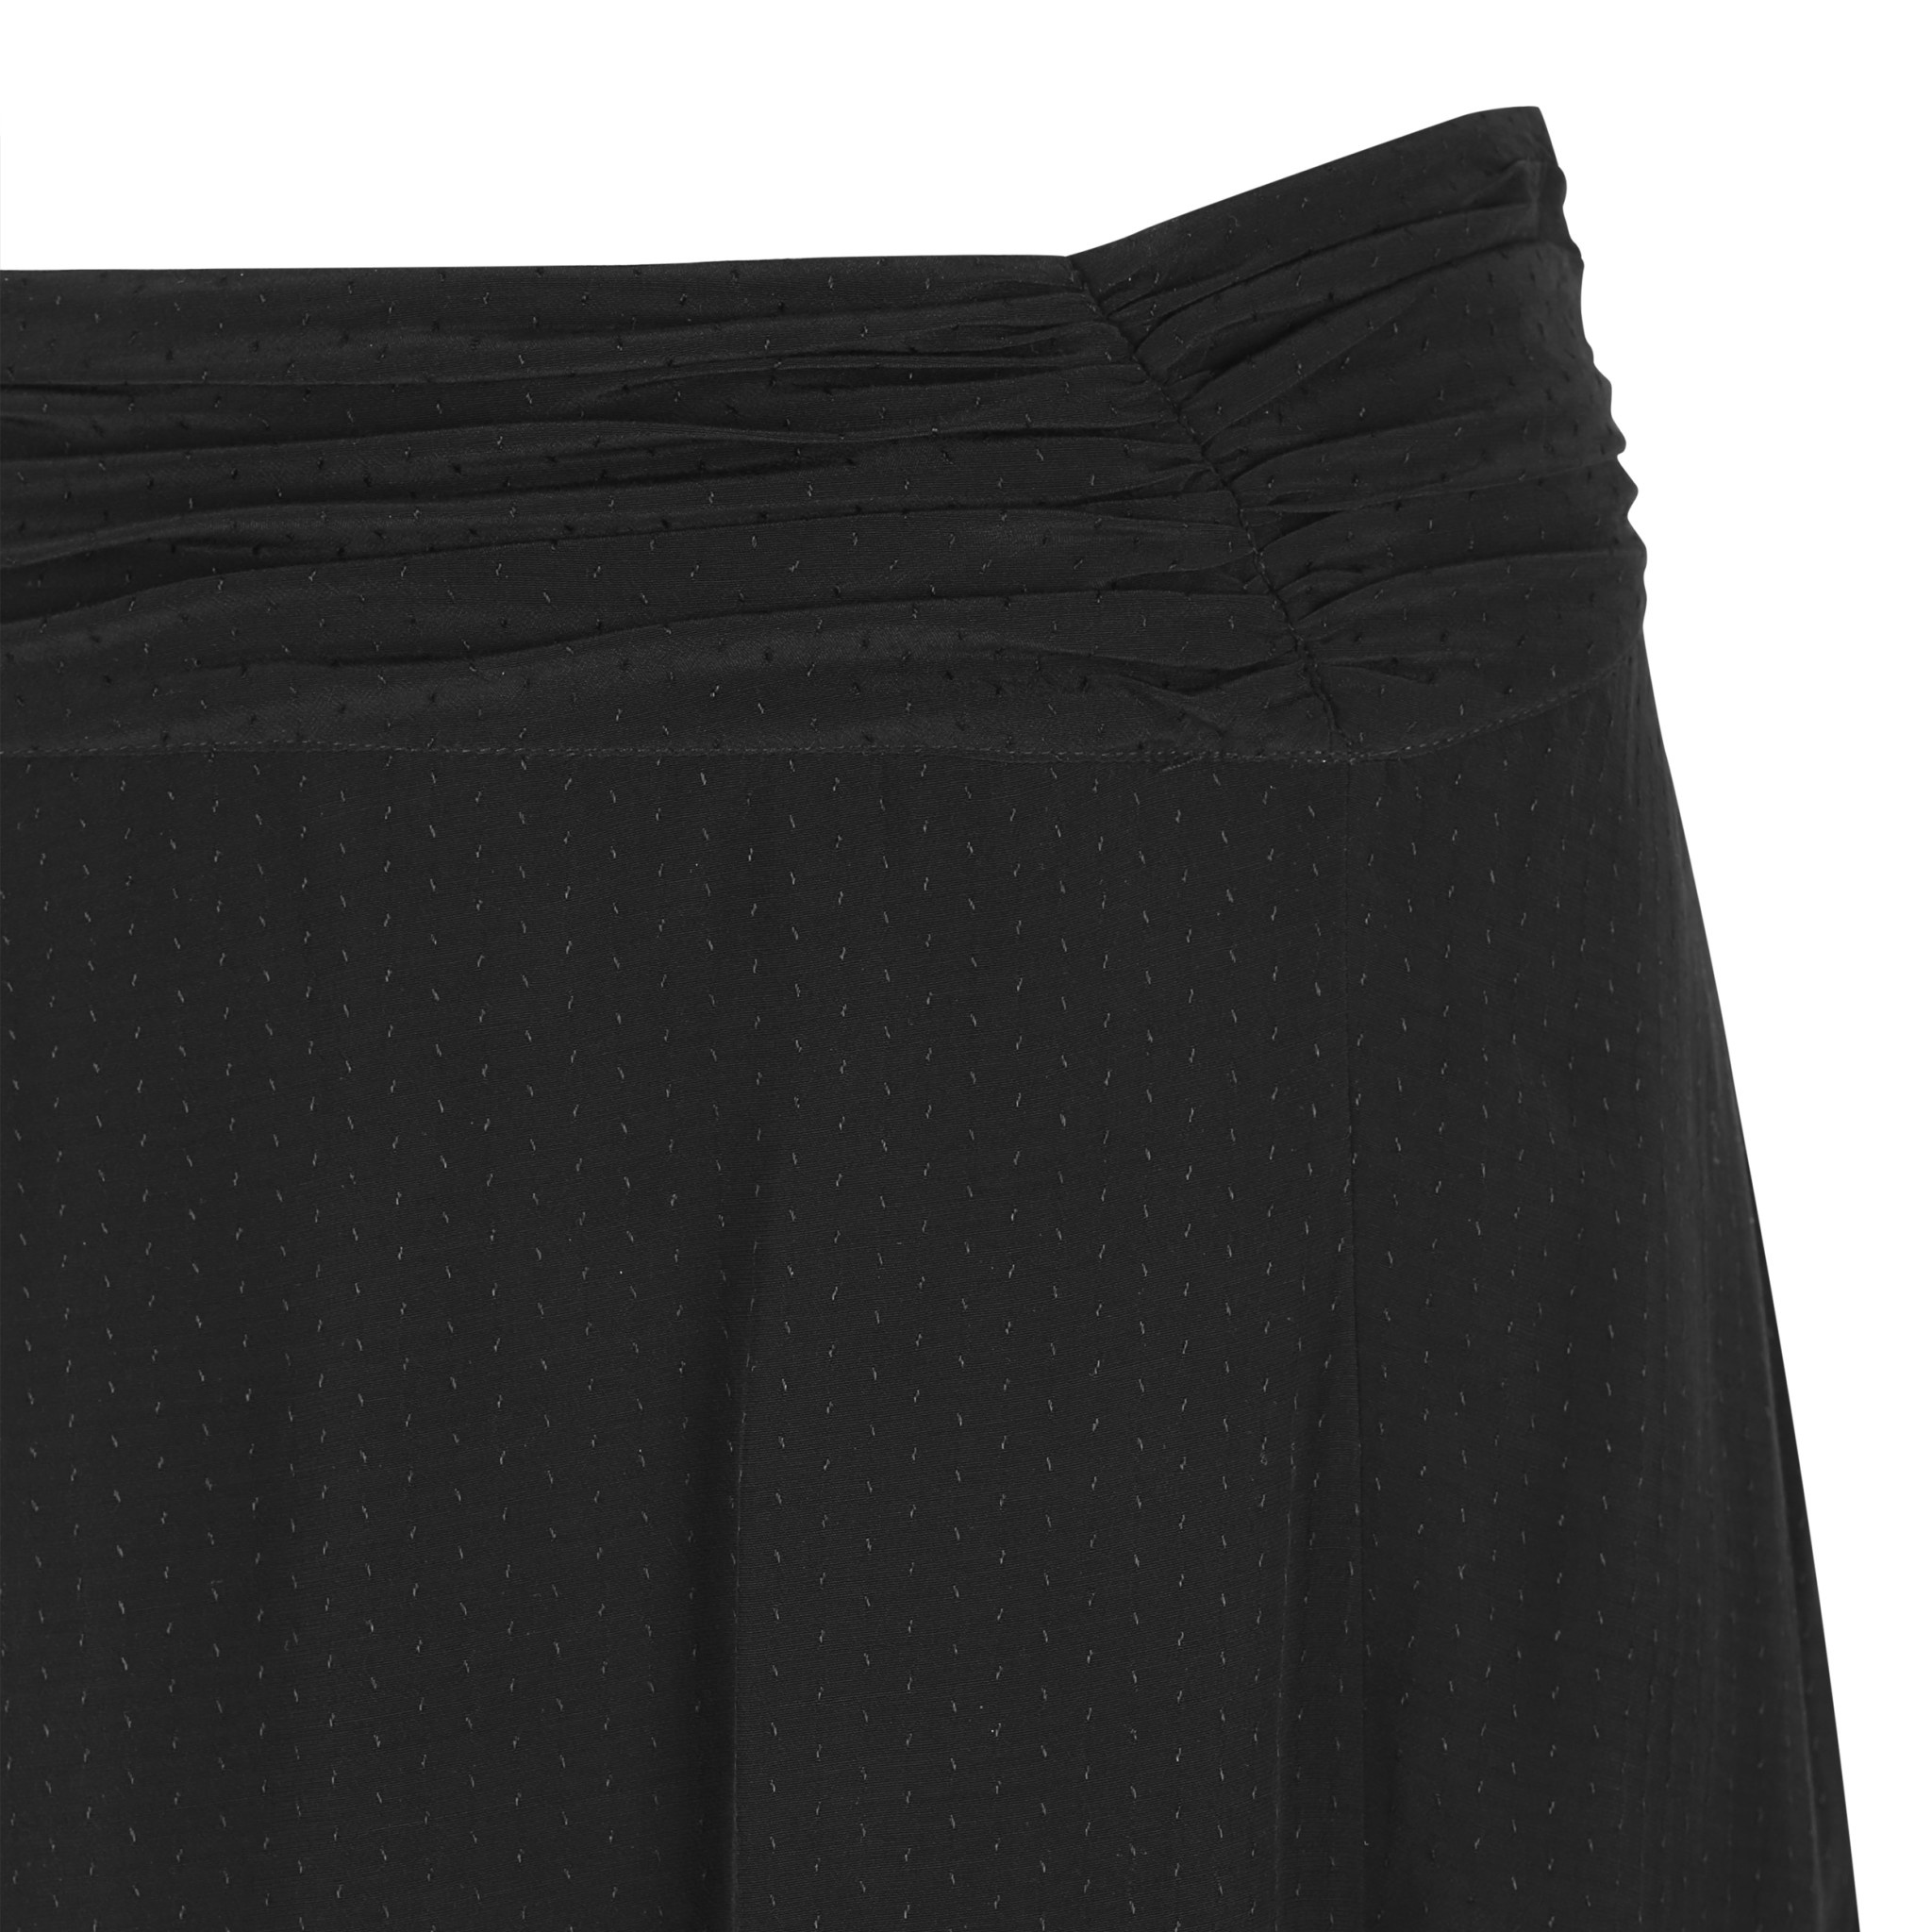 Soft Rebels Dita Skirt - Black